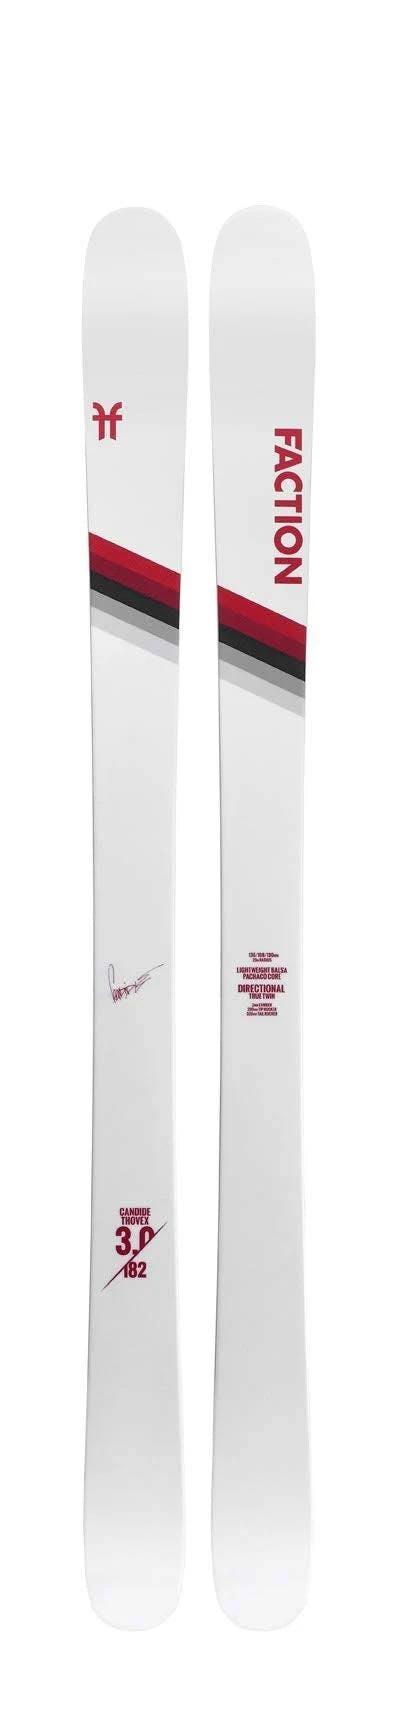 Faction Ski Candide 3.0 Skis · 2020